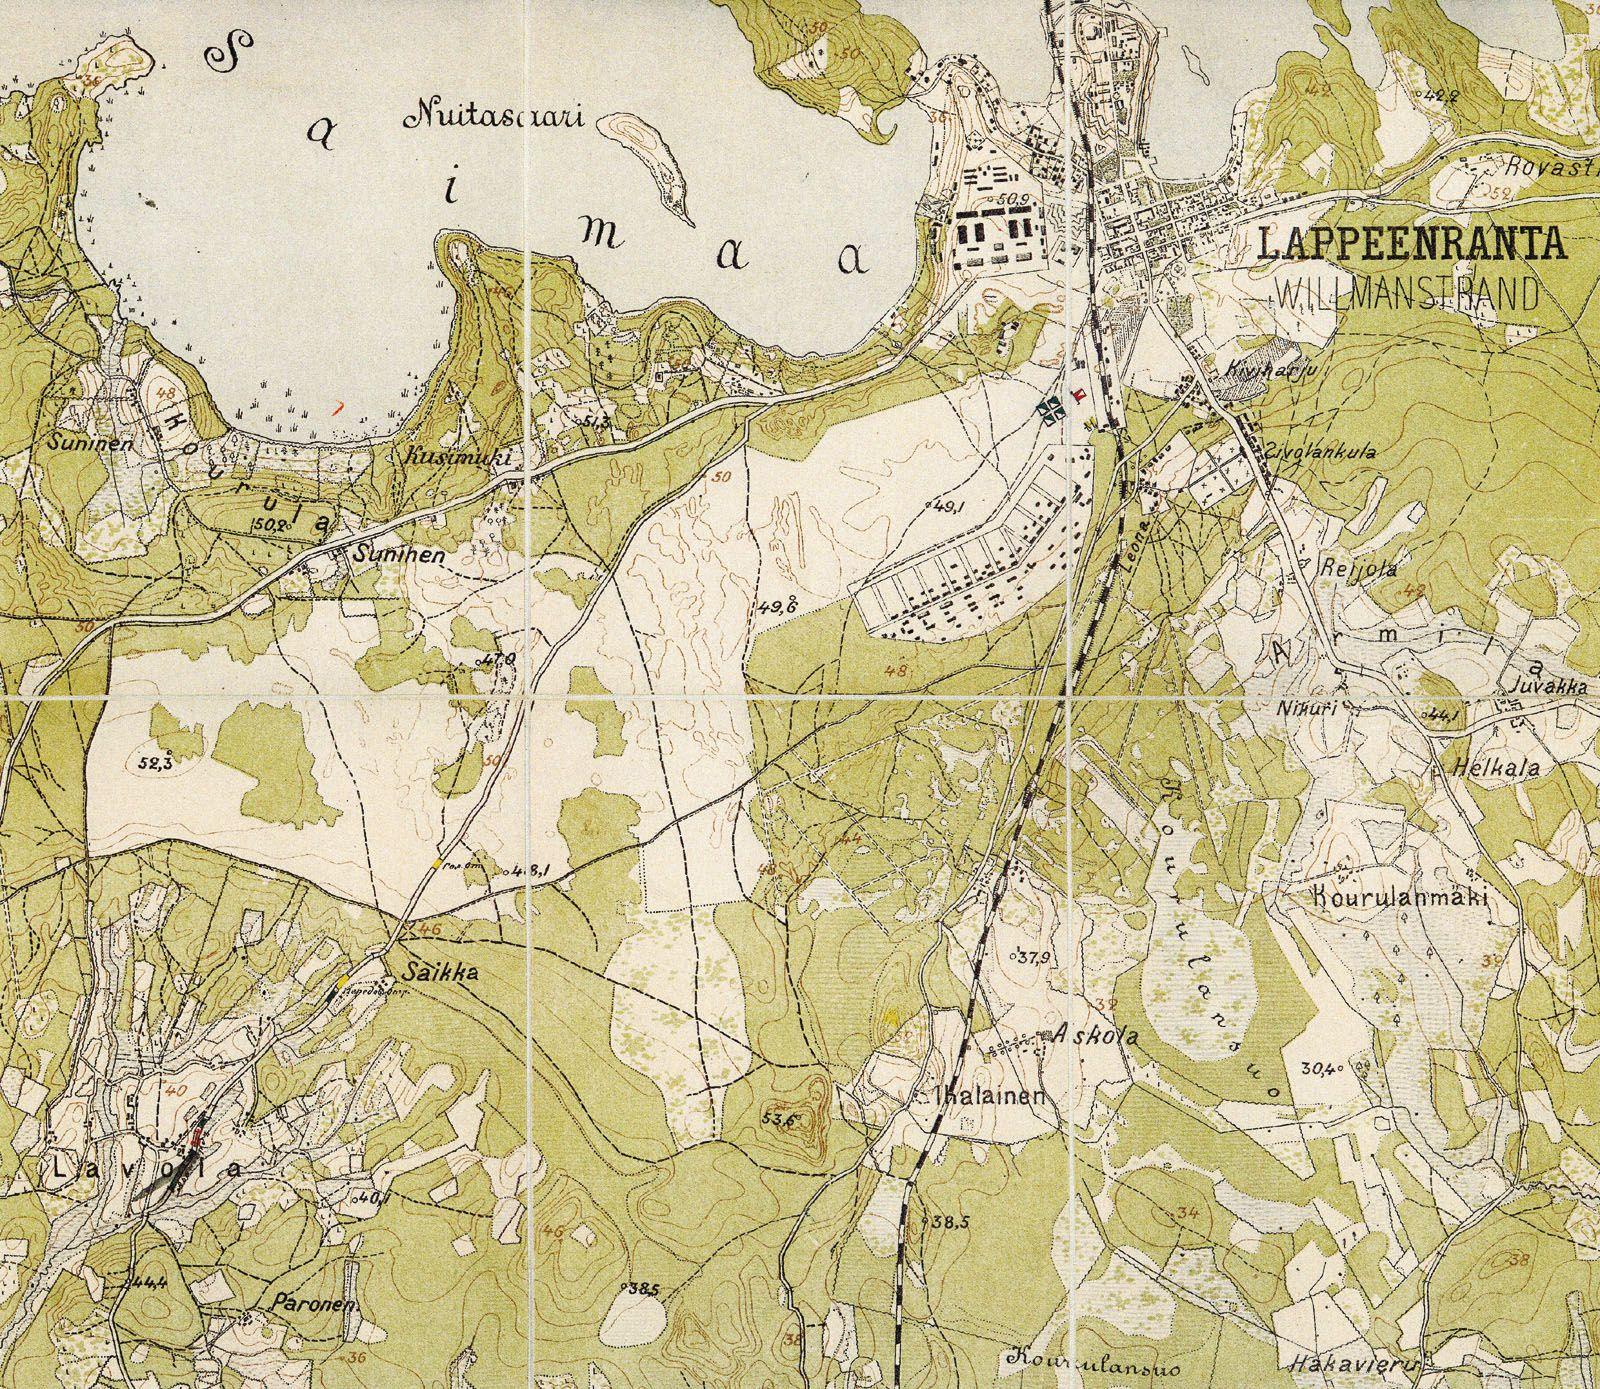 Old map Lappeenrantawilmanstrad Finland Maps Pinterest